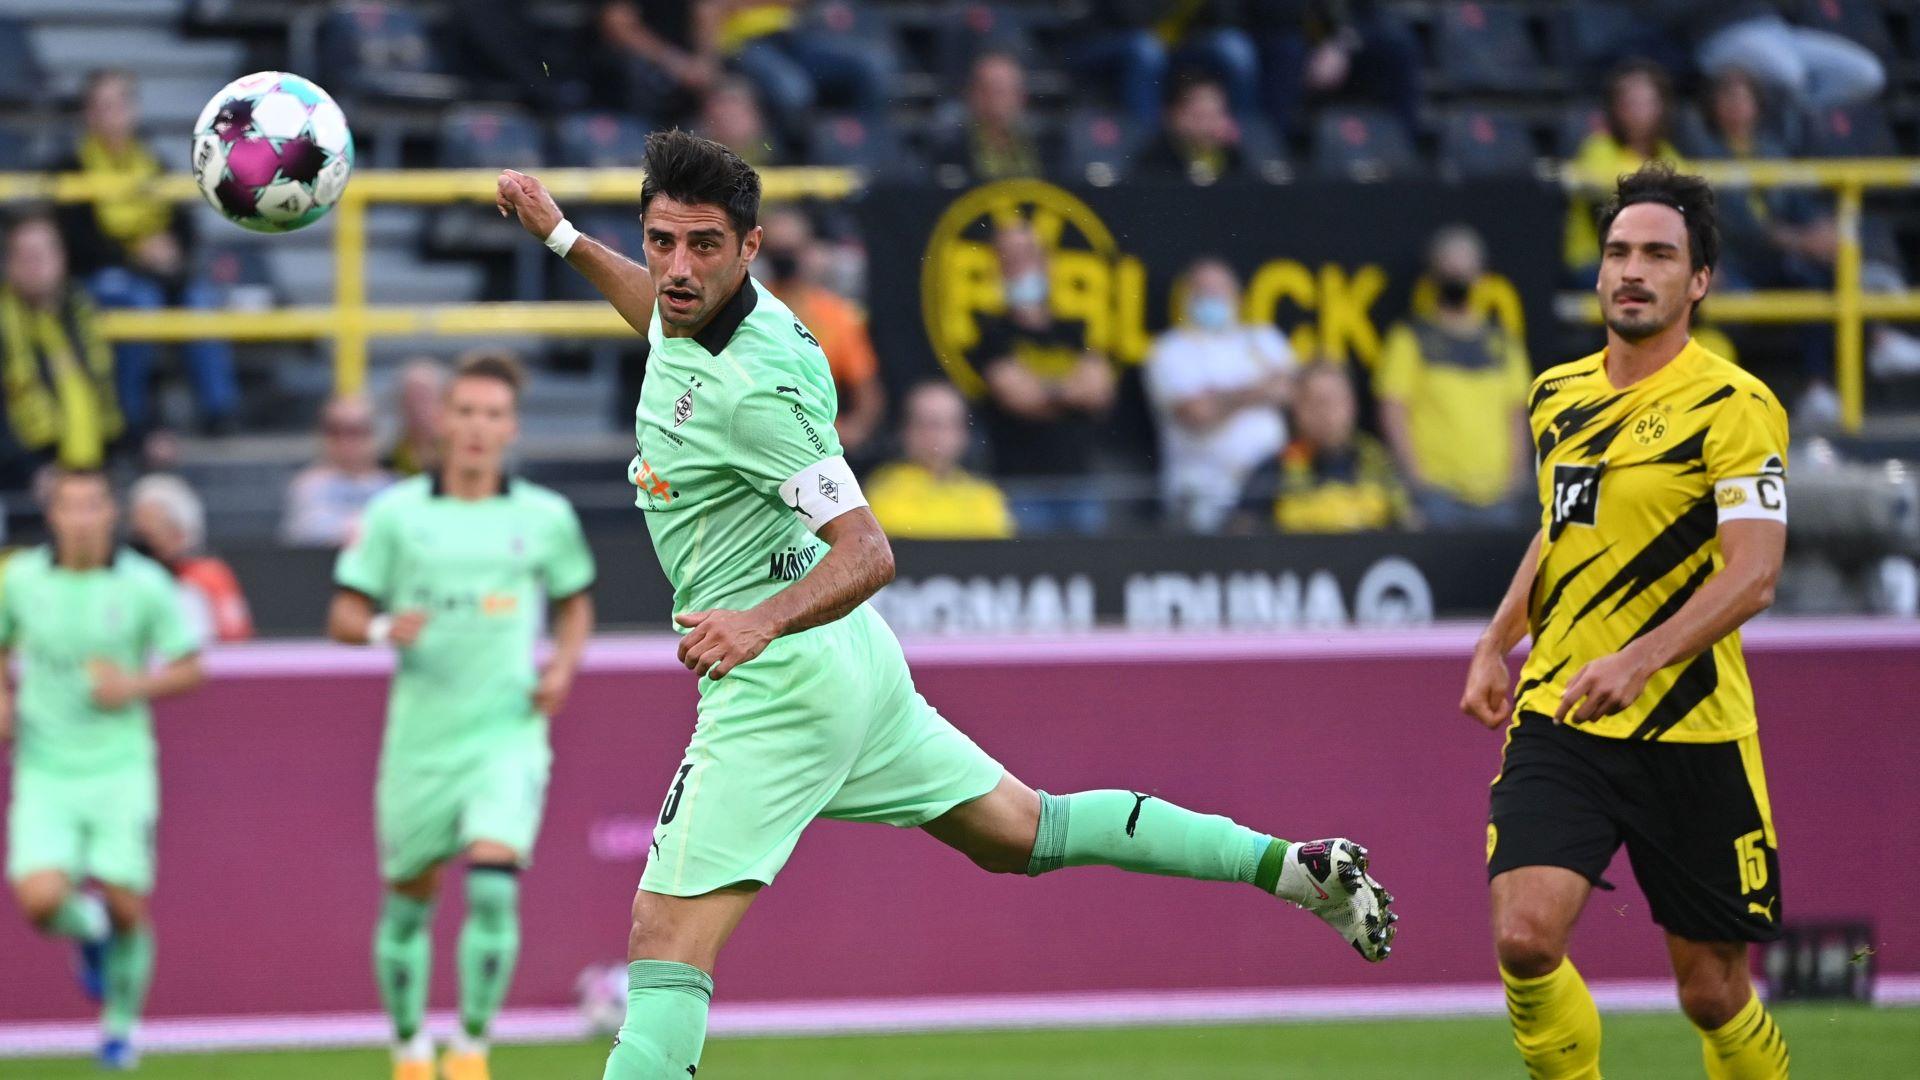 Borussia Mönchengladbach Borussia Dortmund Stindl Hummels